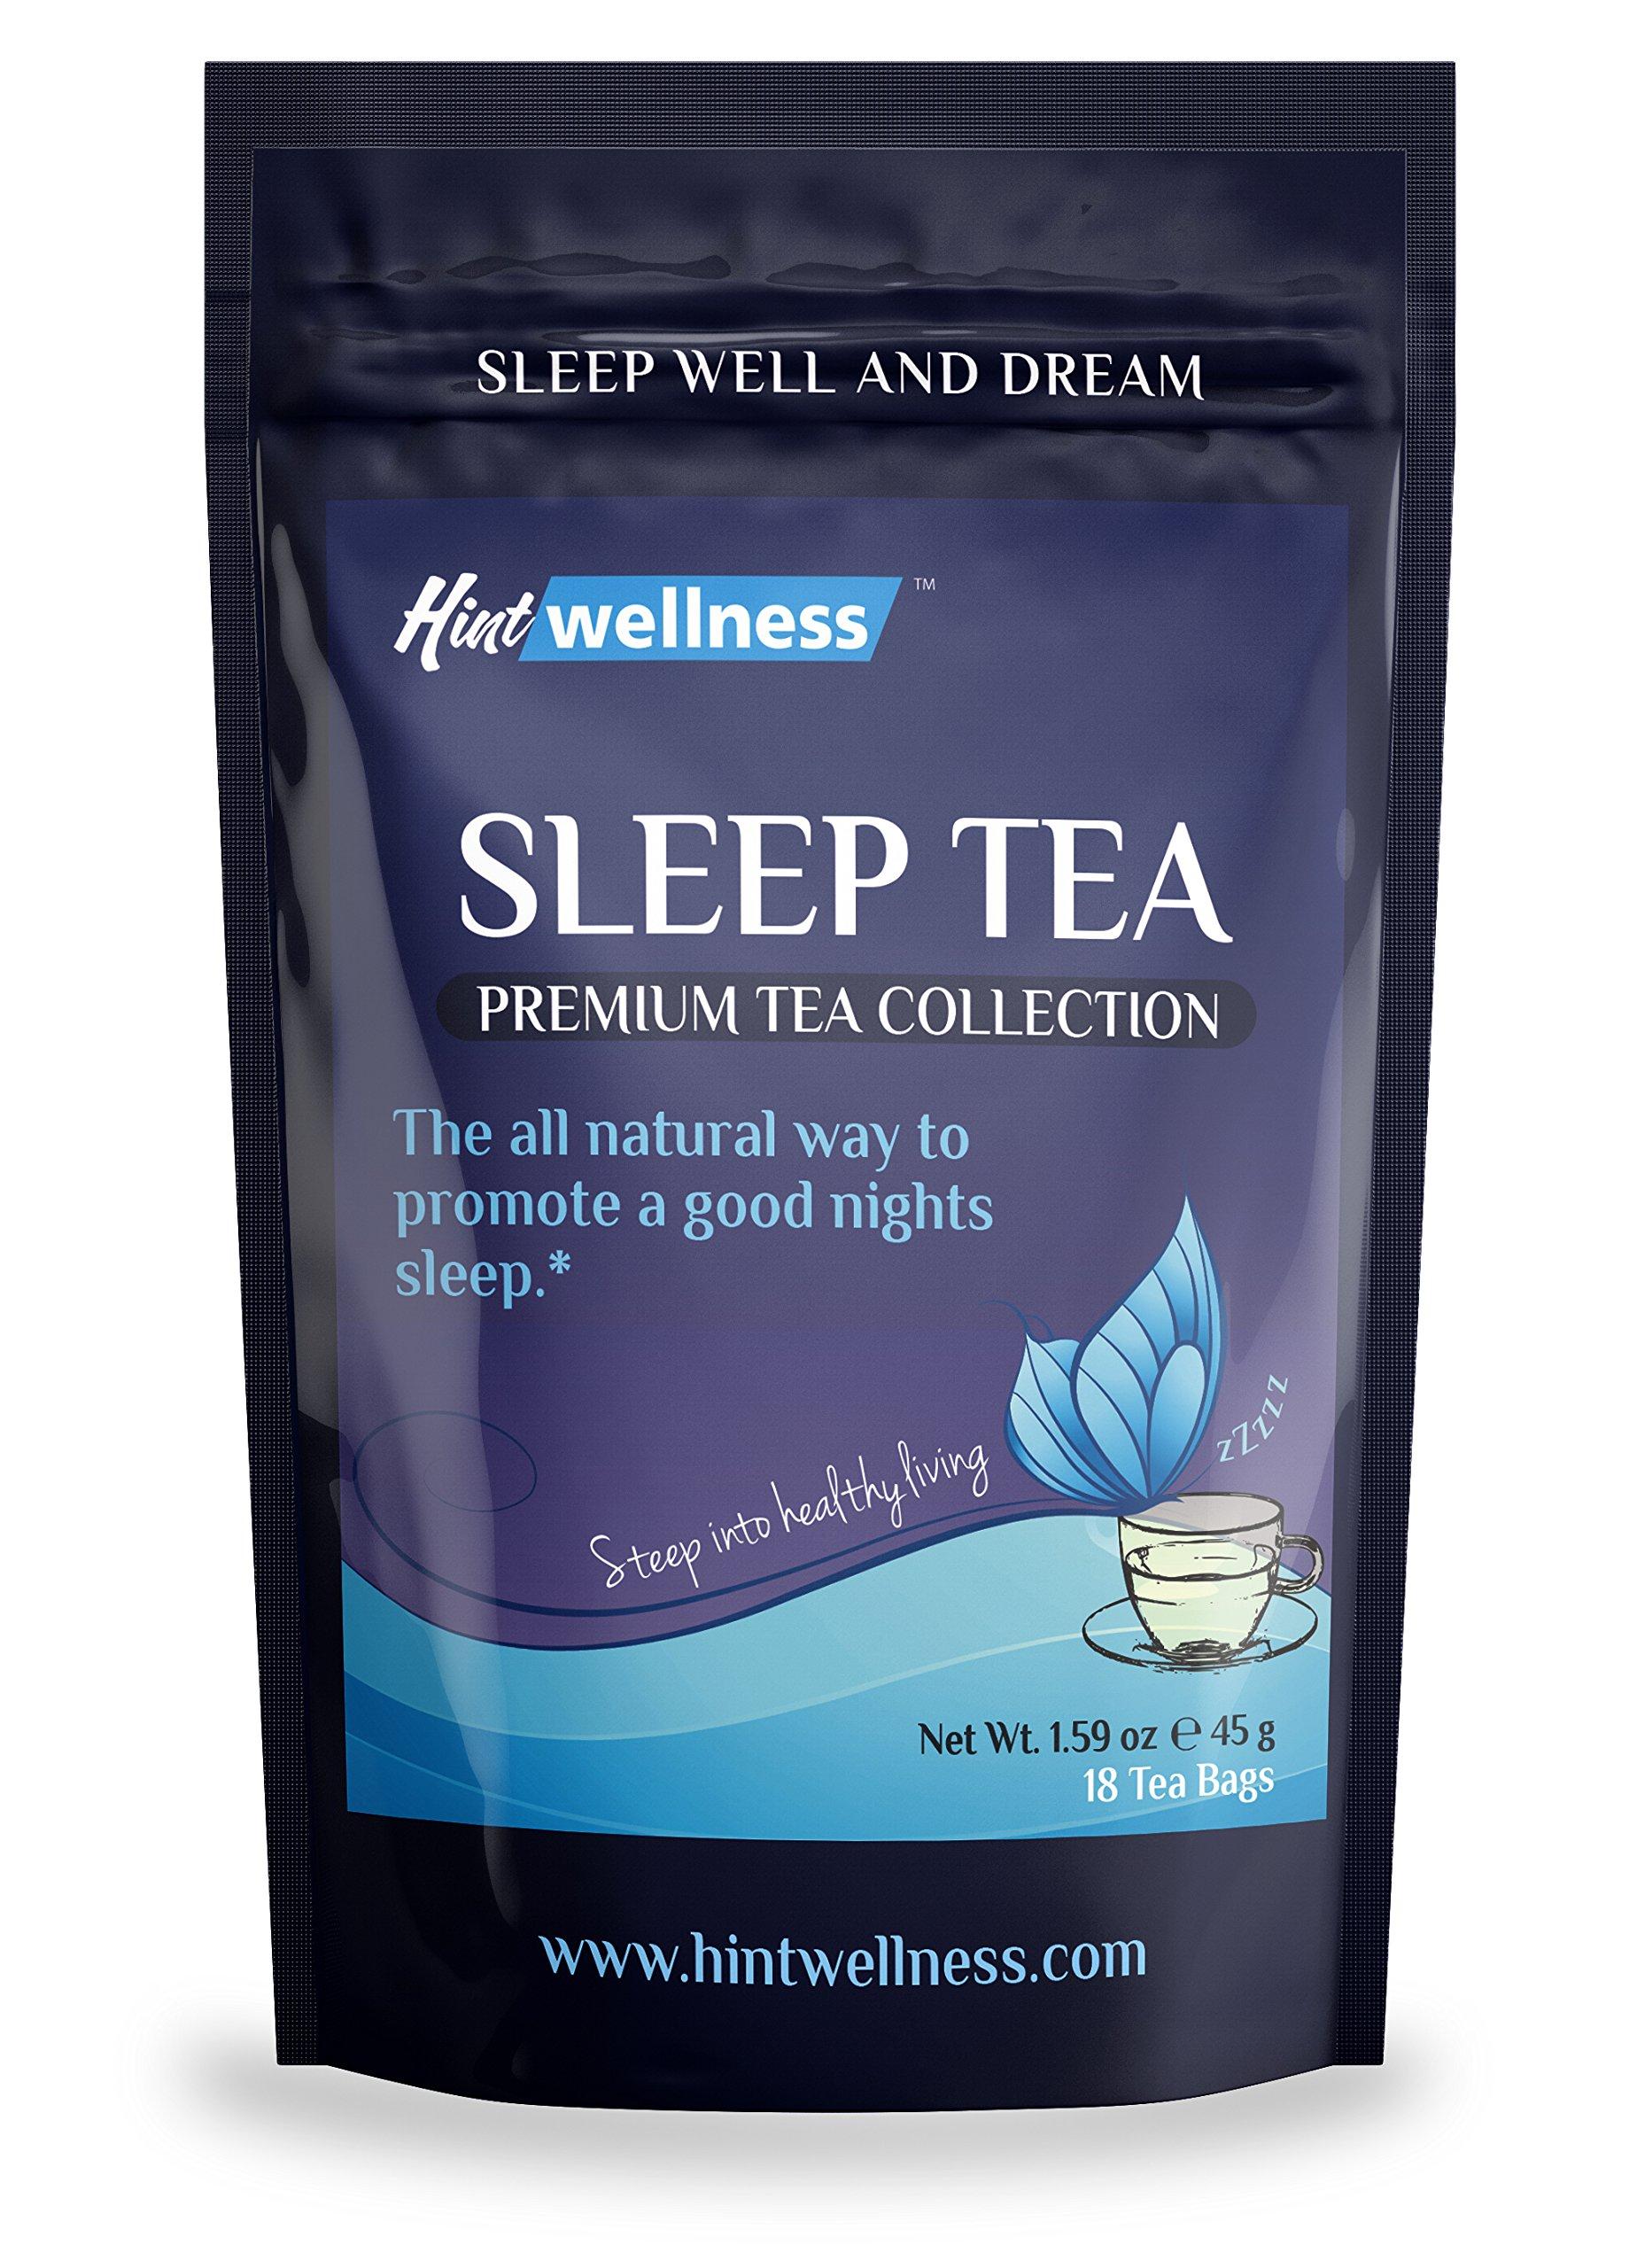 Sleep Tea - Natural Sleep Aid With Valerian Root and Chamomile - Herbal Sleep Aid Tea By Hint Wellness - 18 Tea Bags - 45 g